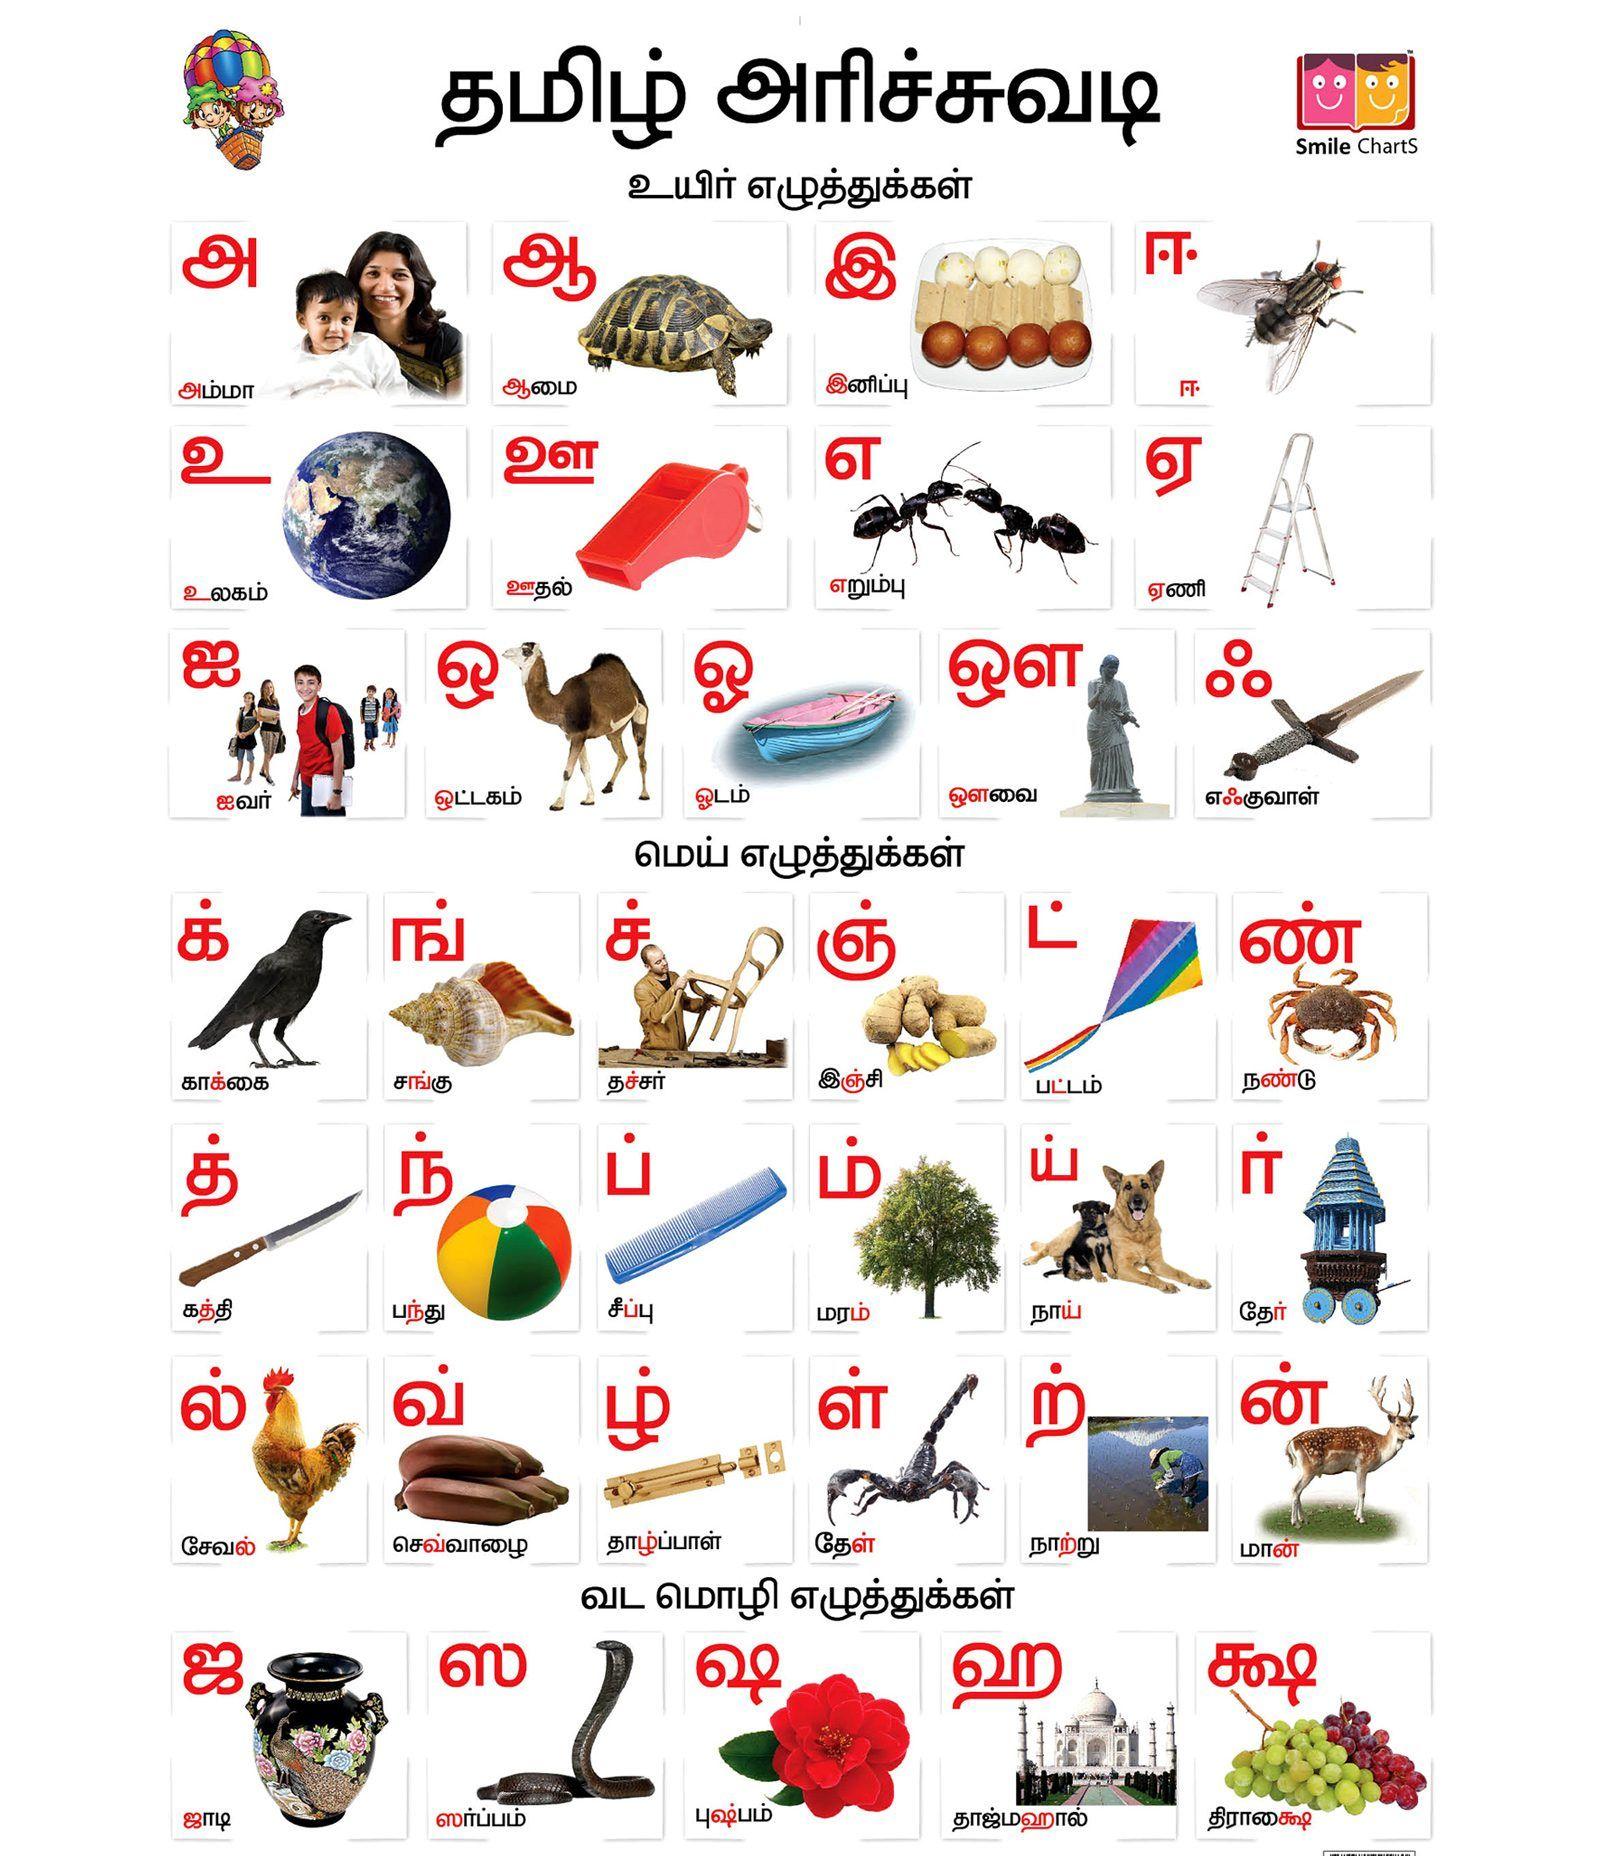 Tamil Alphabets For Kids E1494332543424 Jpg 1599 1856 Alphabet For Kids Alphabet Chart Printable Alphabet Pictures